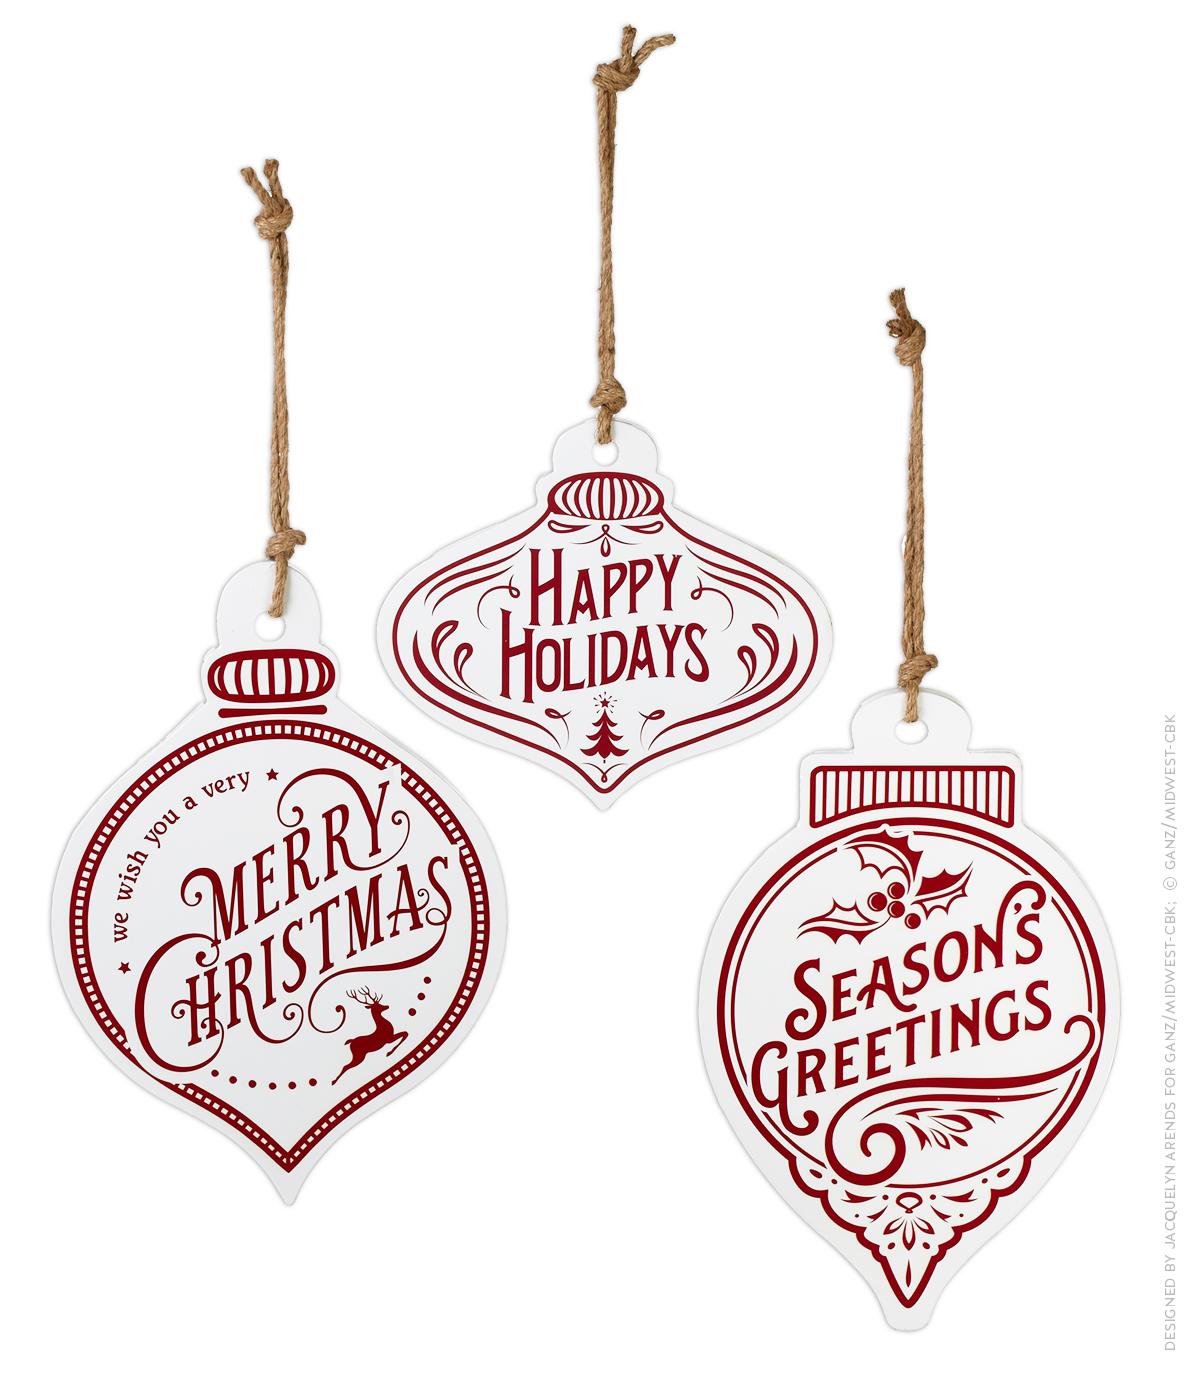 Large Enamel Hanging Ornaments; © Ganz/Midwest-CBK 2019